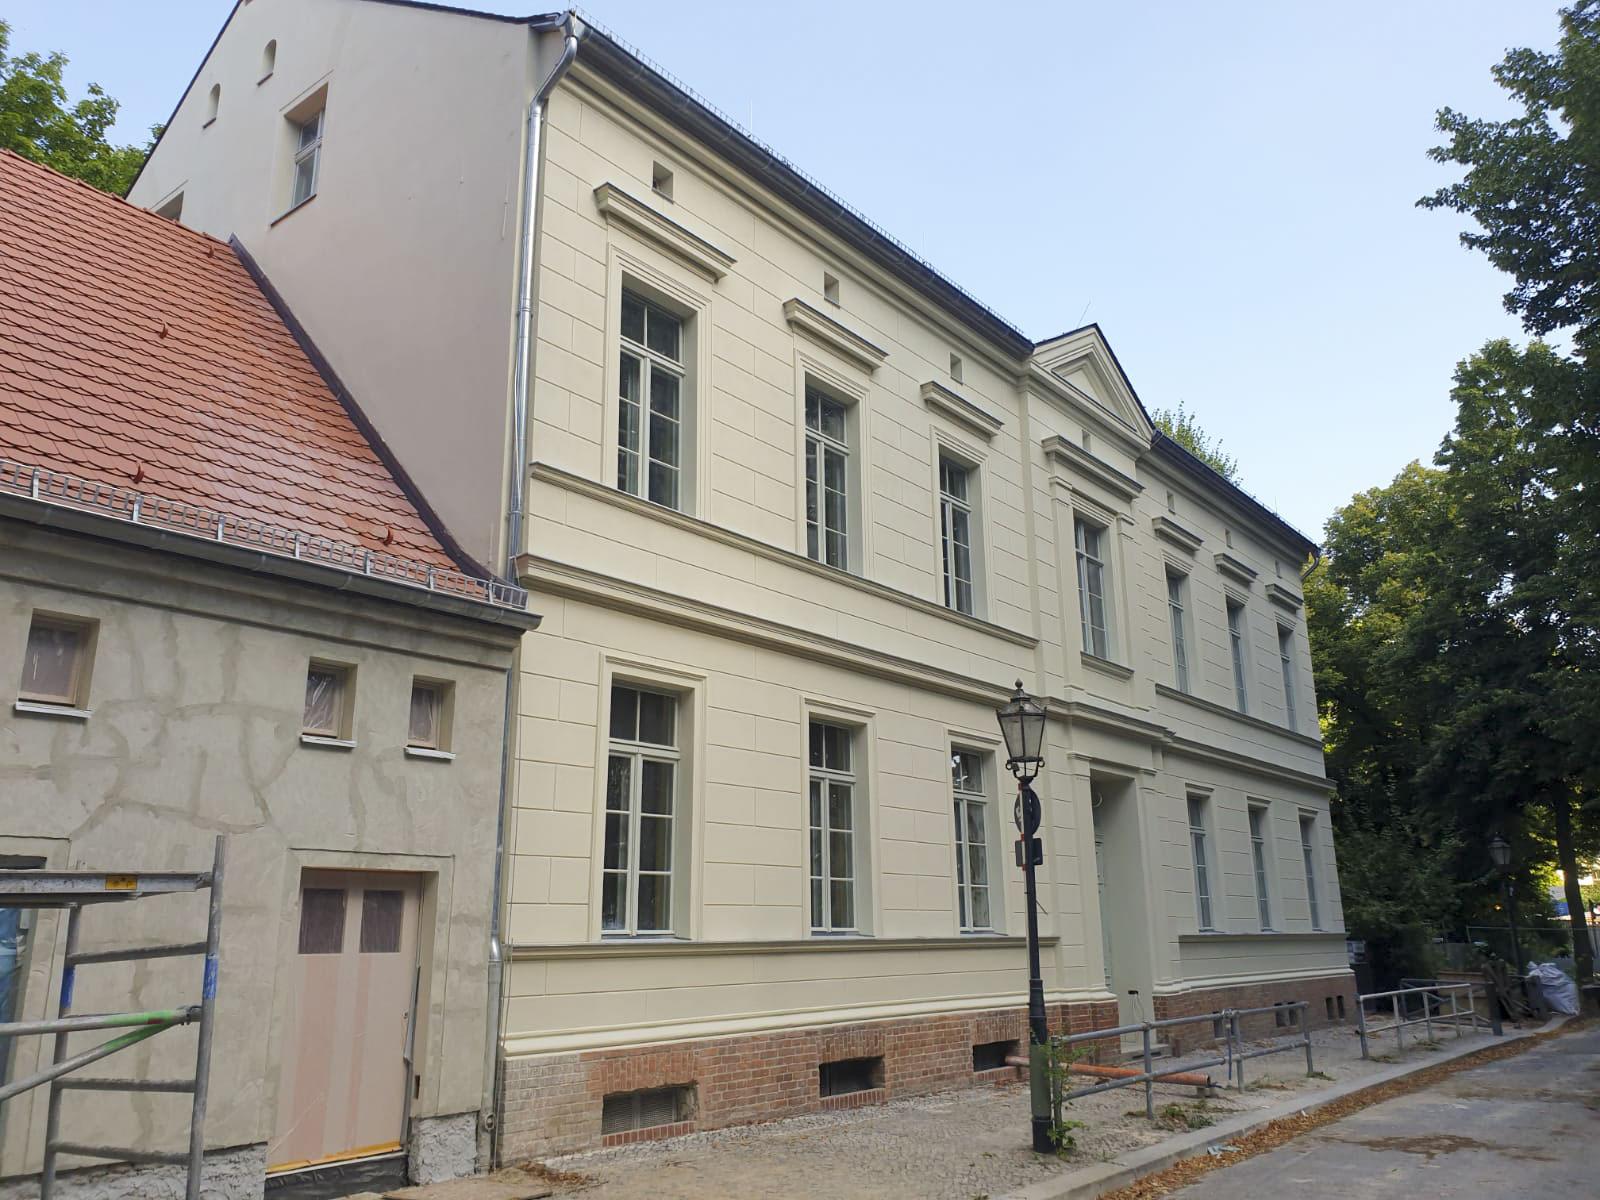 Sanierung einer denkmalgeschützten Grundschule, Backbergstraße, Berlin